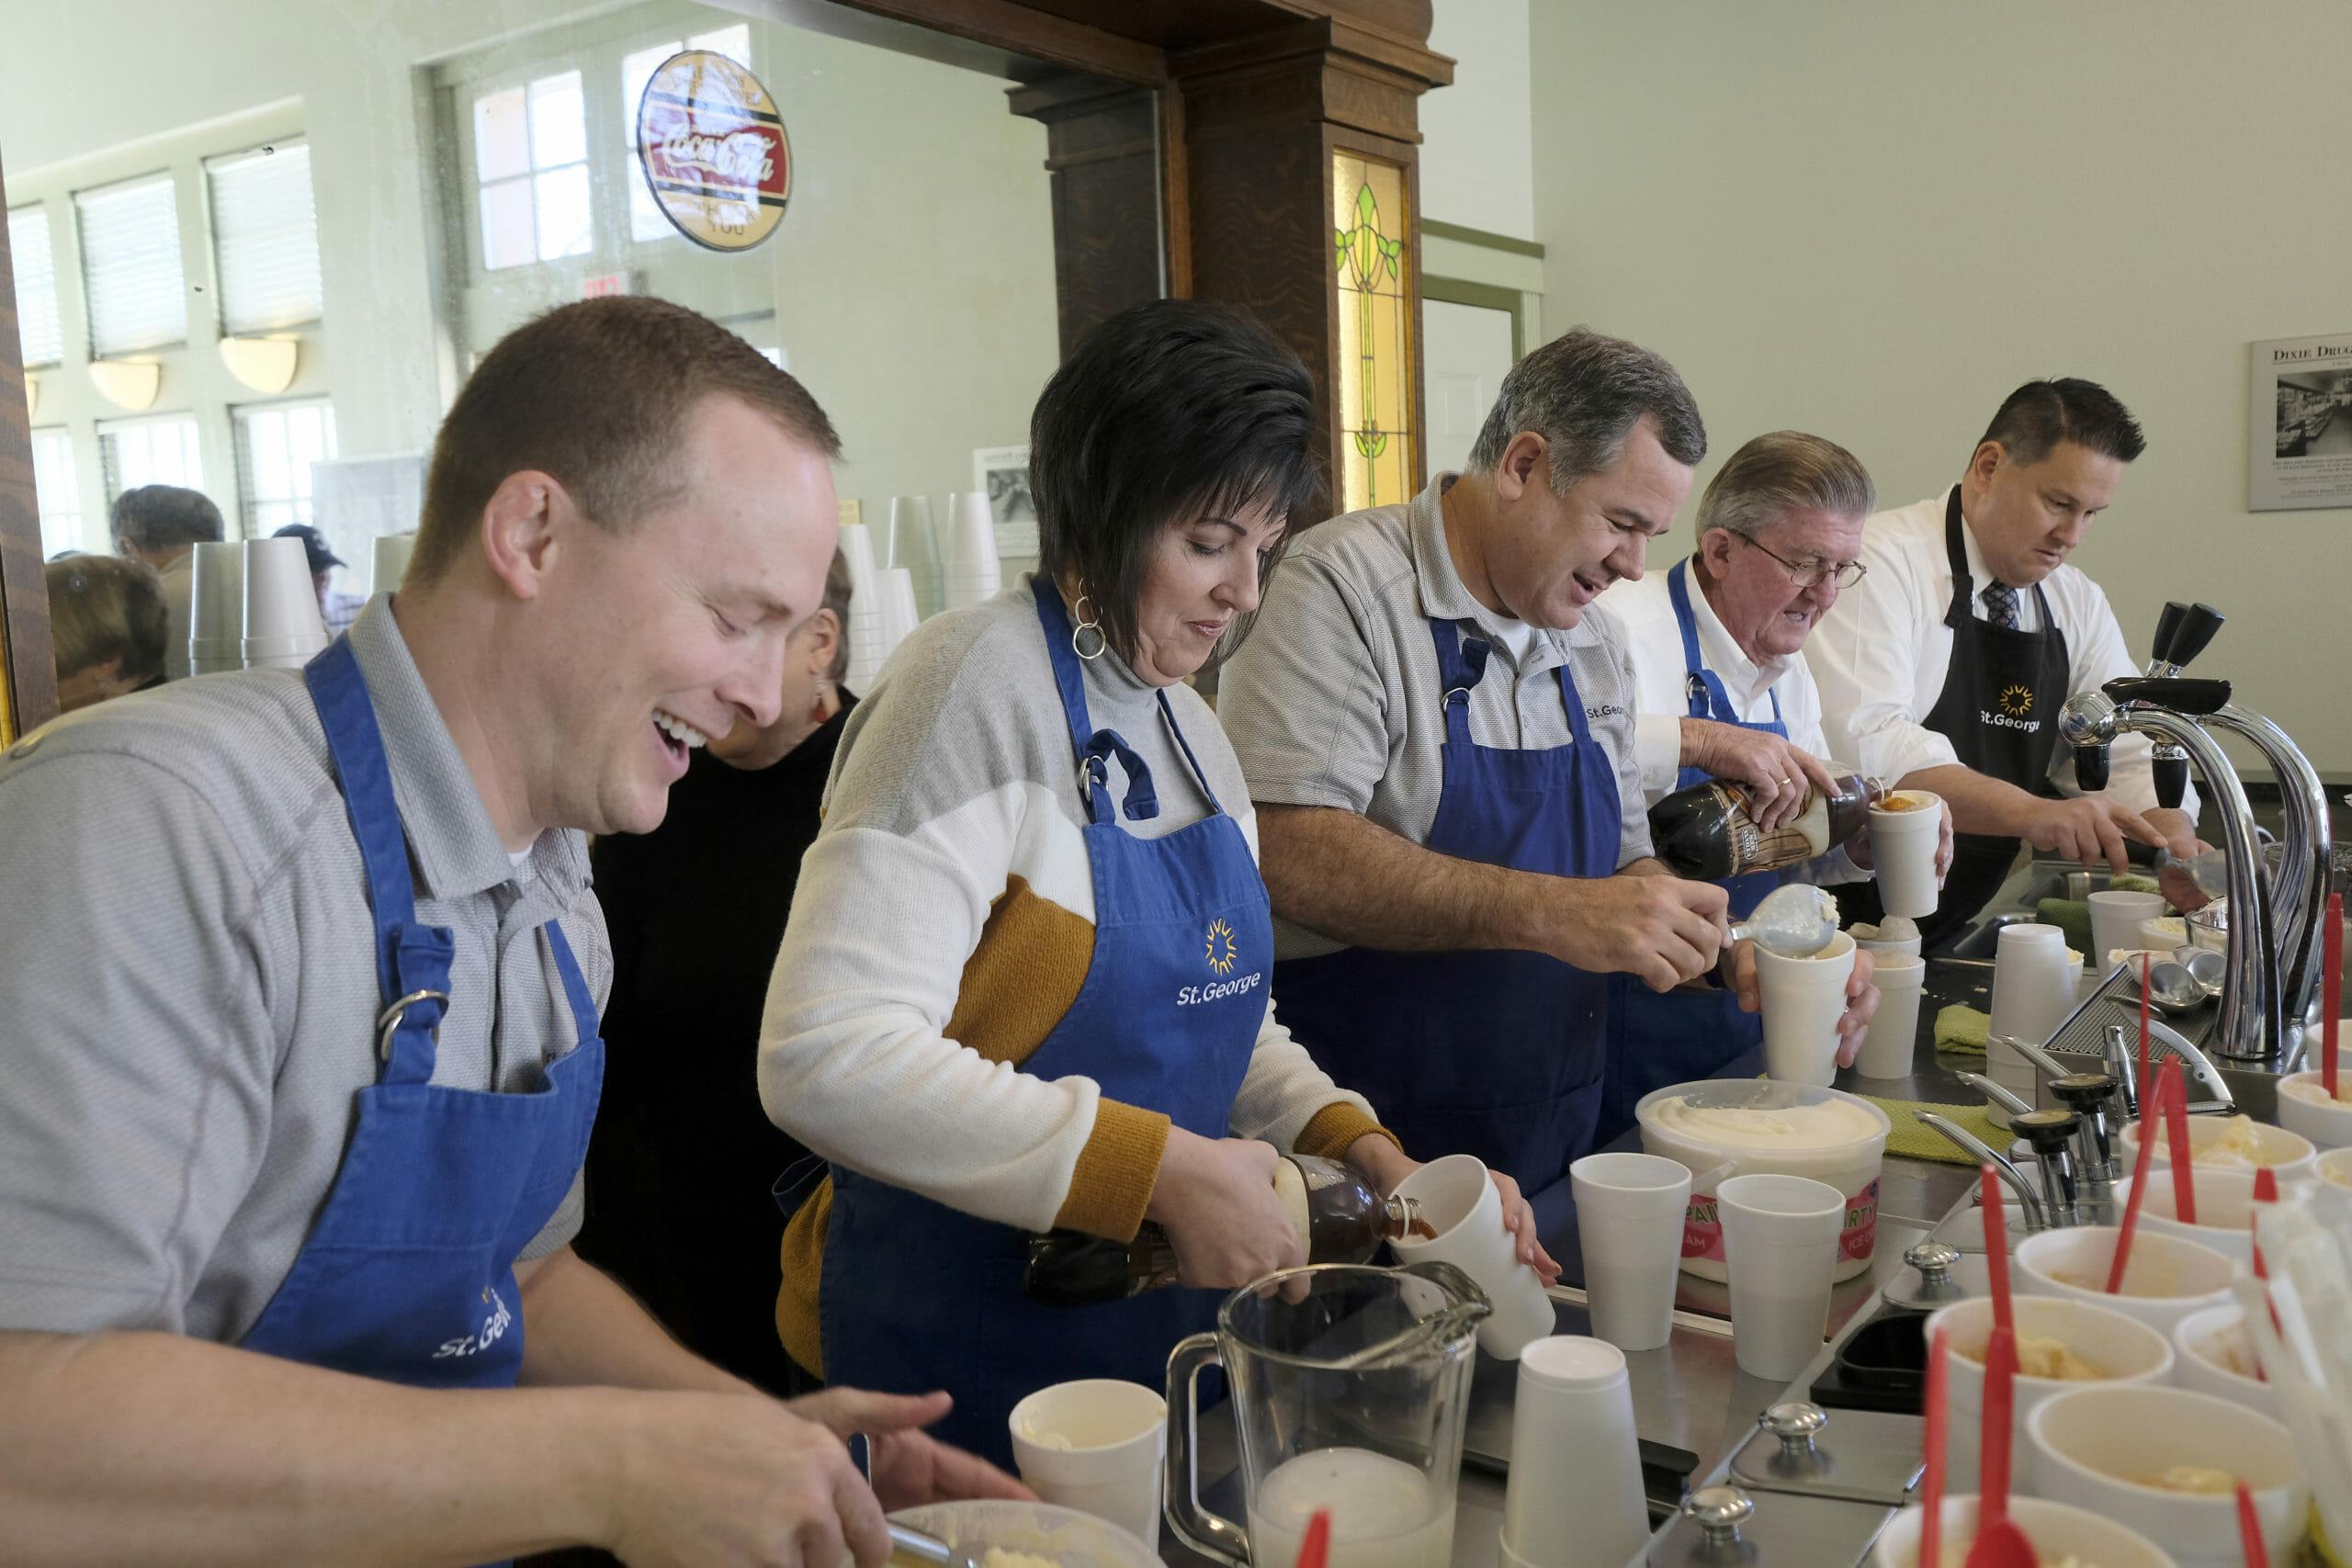 People serving ice cream